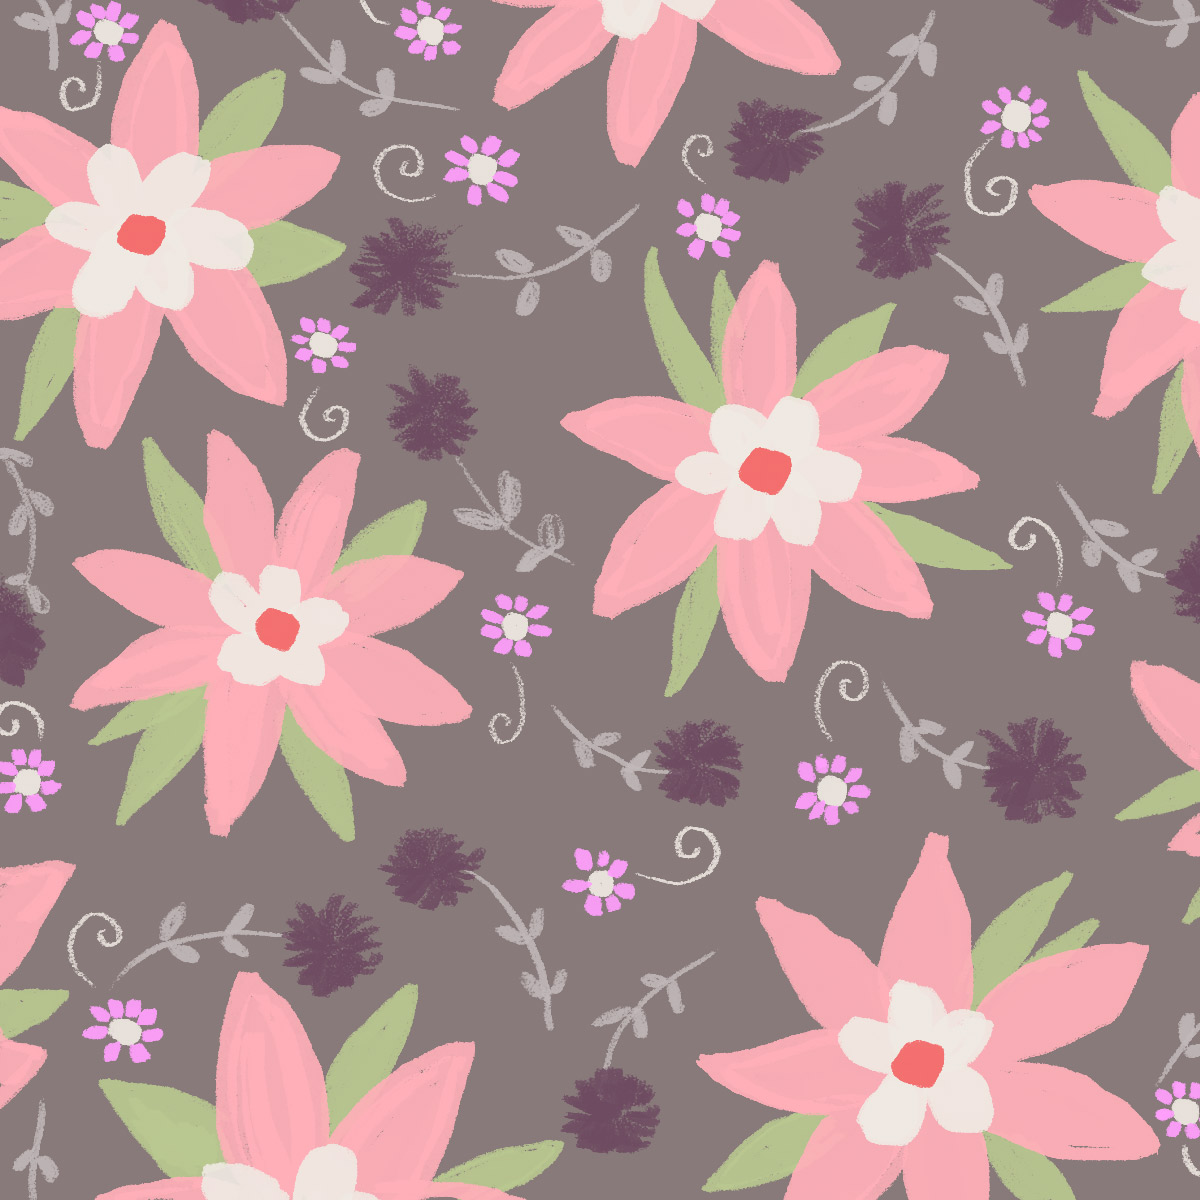 2018-02_FloralPatterns_07.jpg